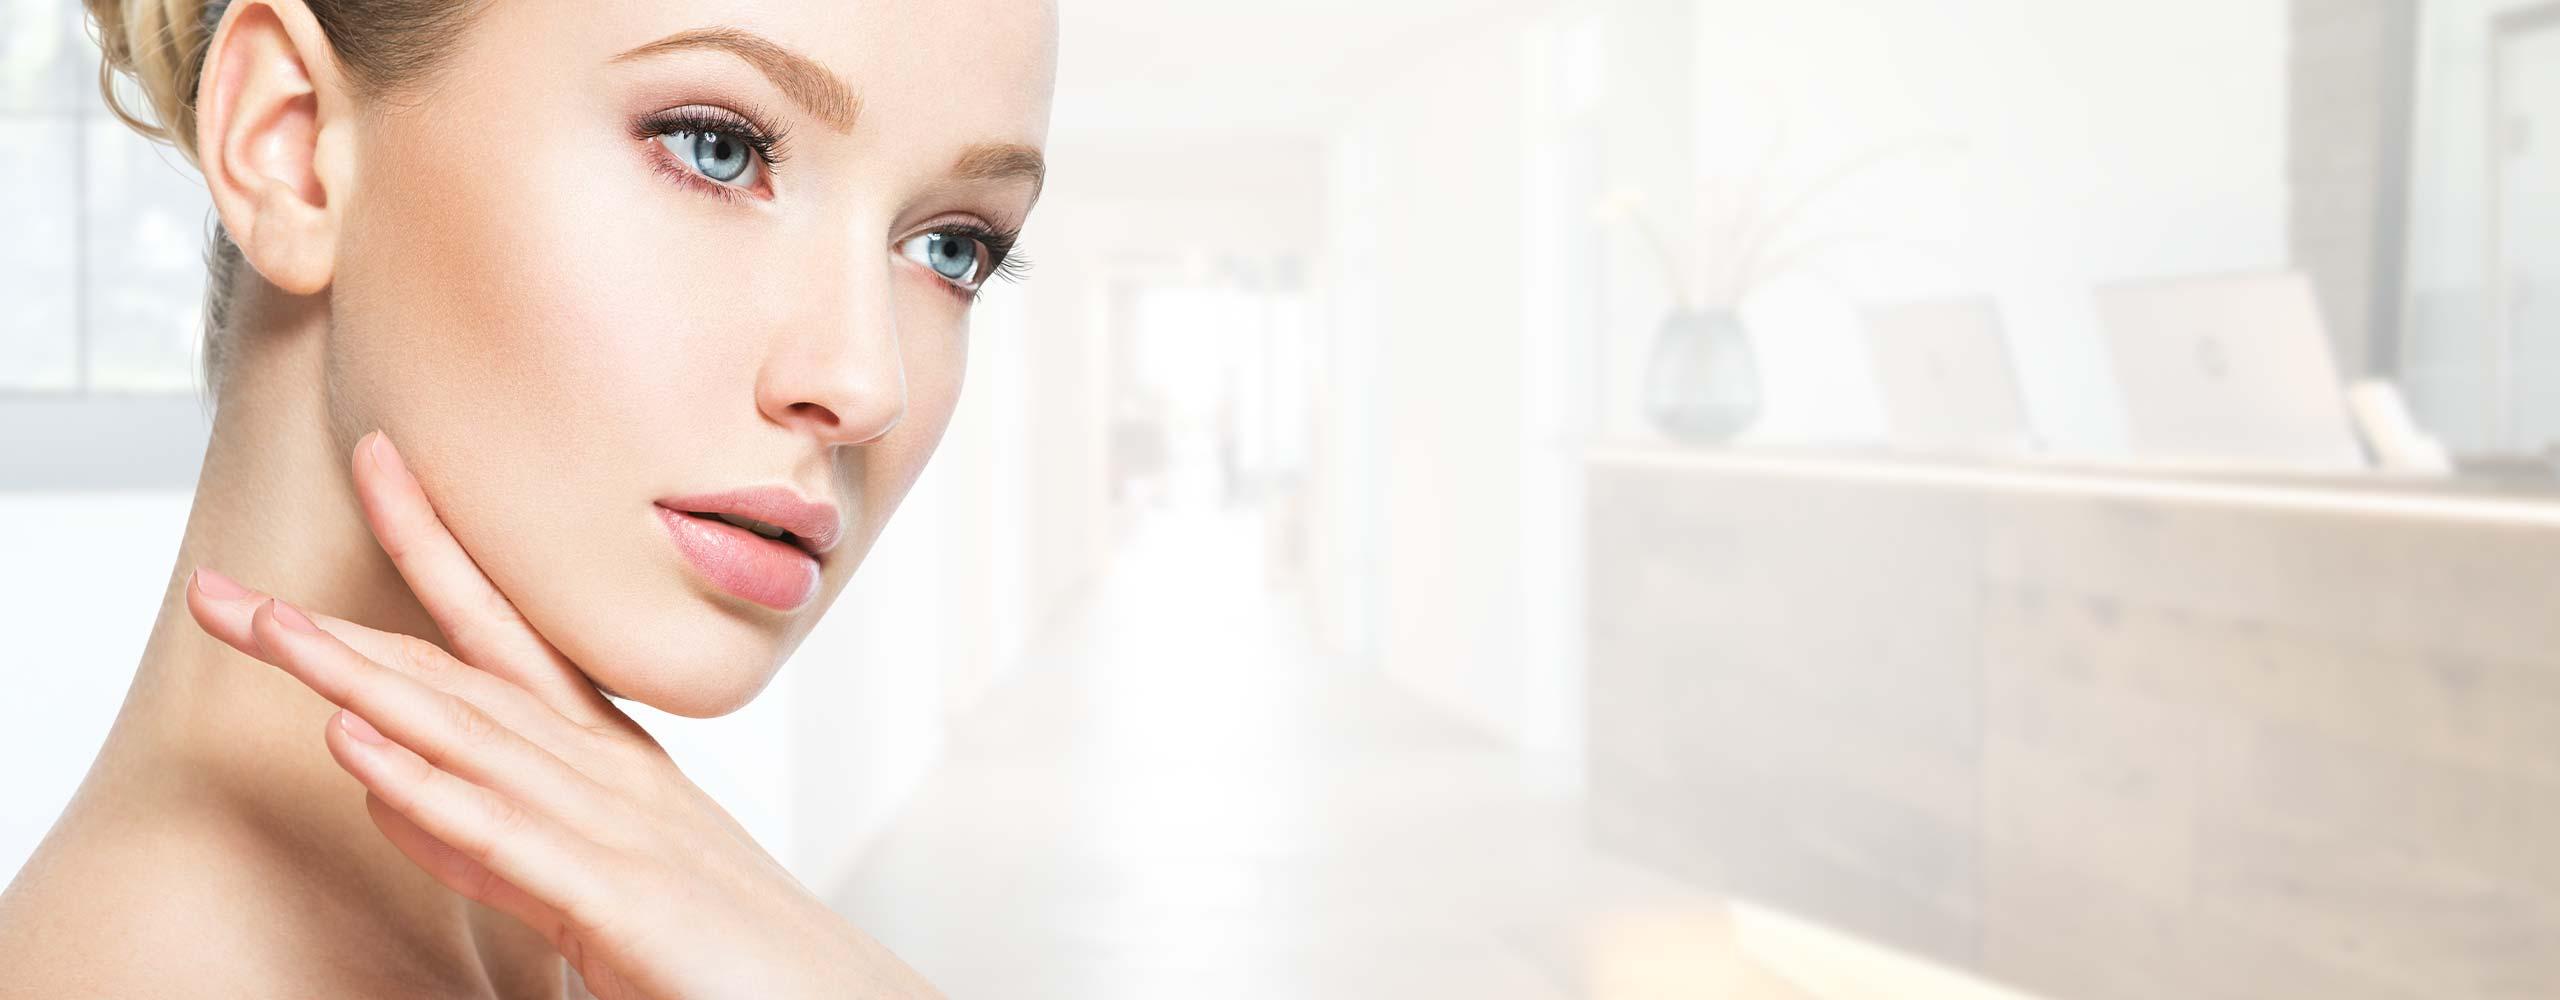 proaesthetic heidelberg schoenheitsklinik kosmetik microneedling